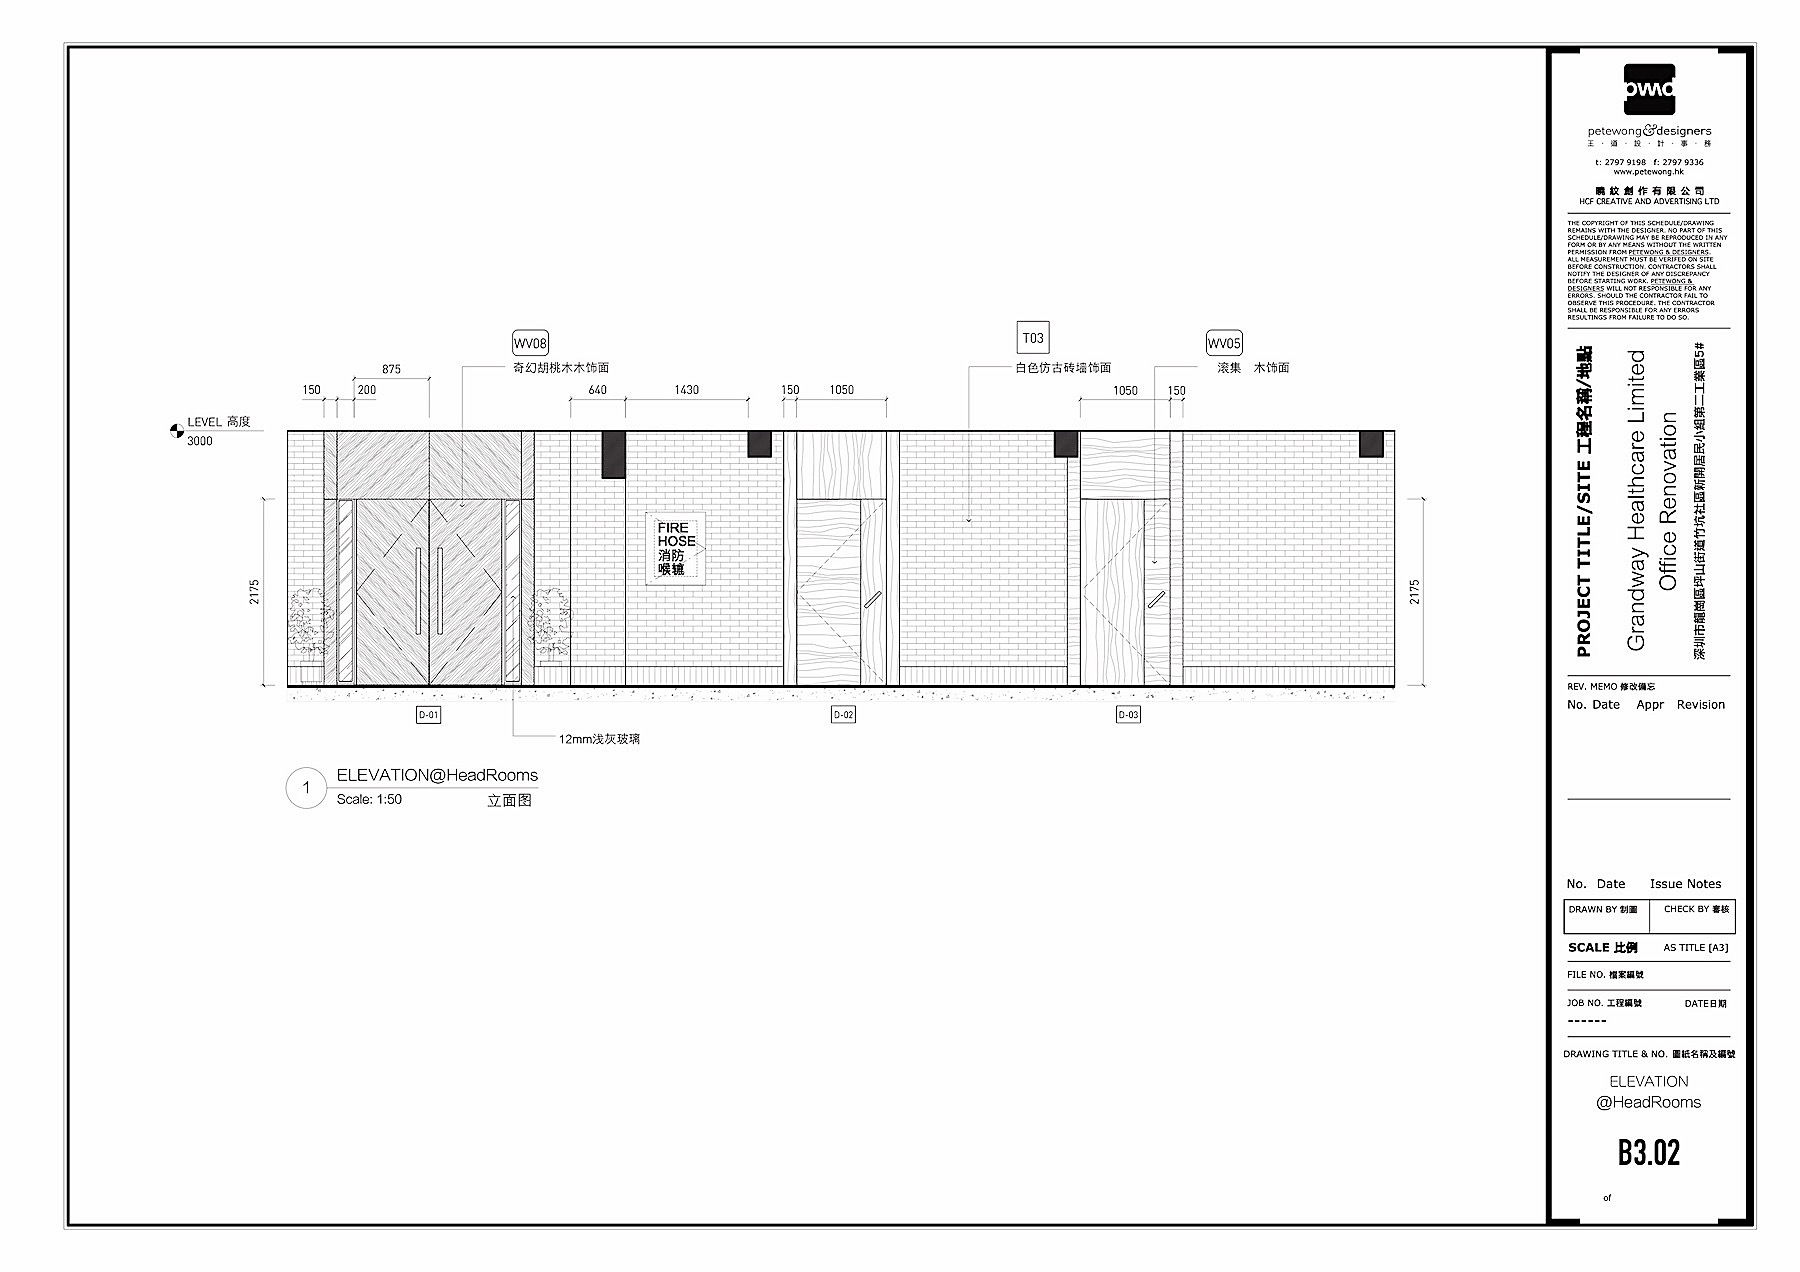 Grandway Office Renovation 2018 Drawing 08